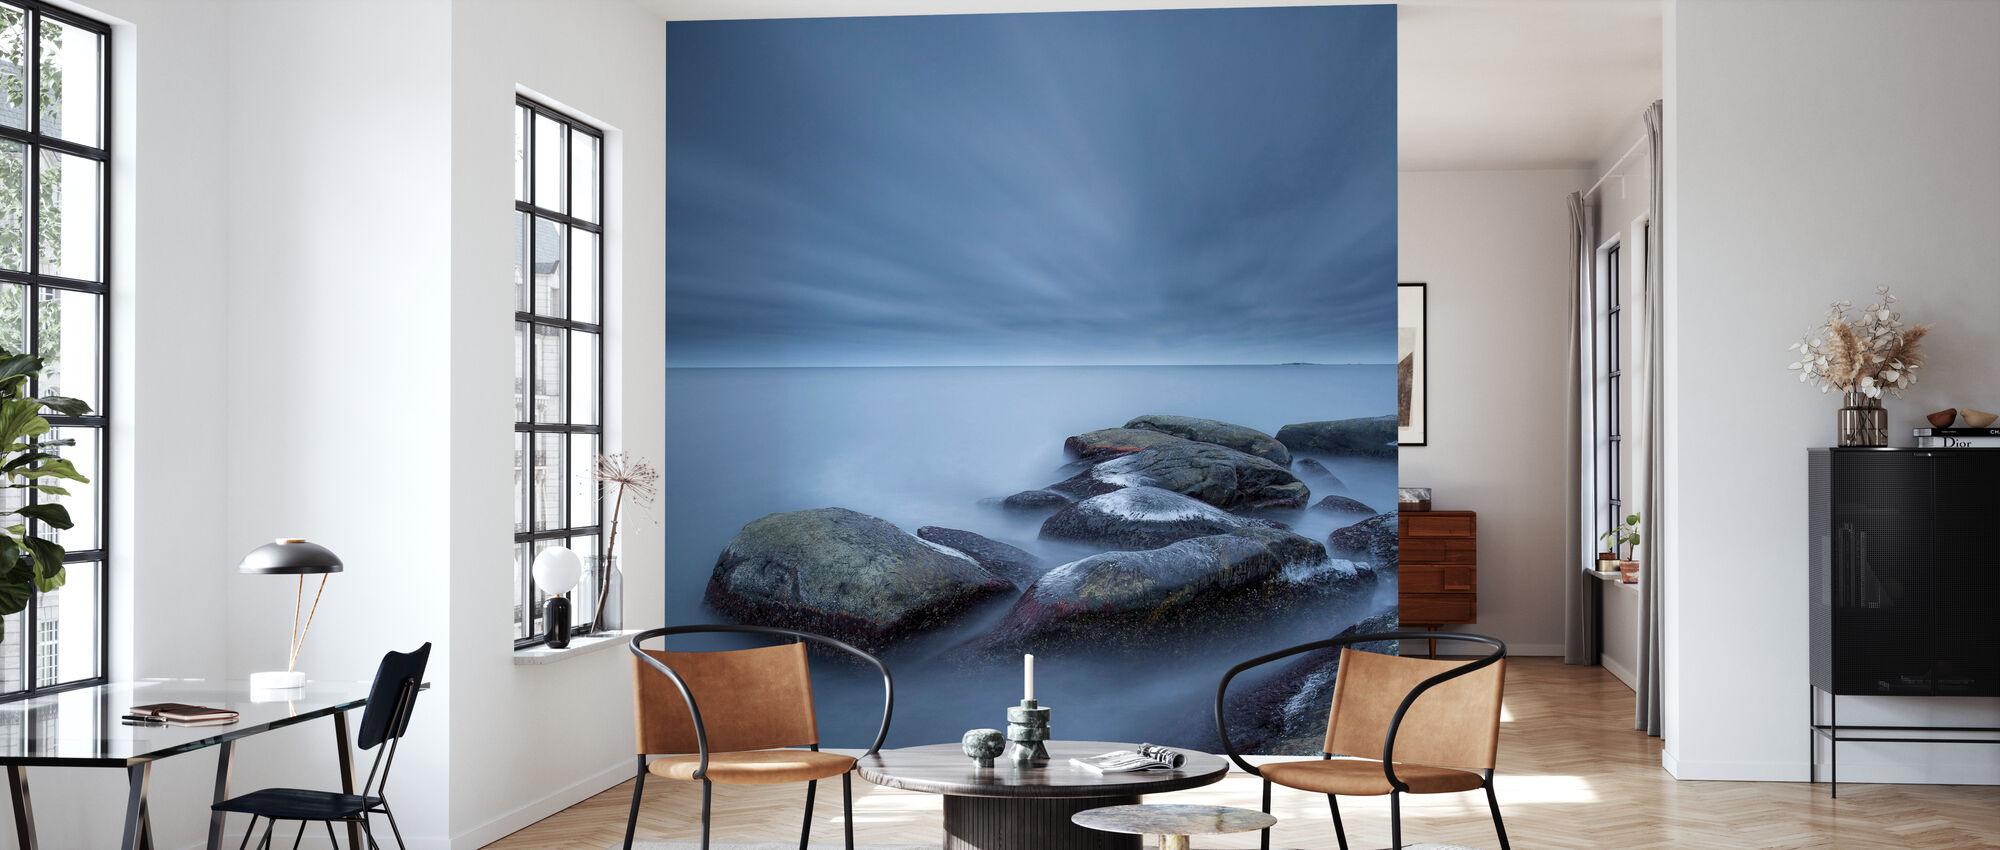 Foggy Stones in Blue Sea - Wallpaper - Living Room